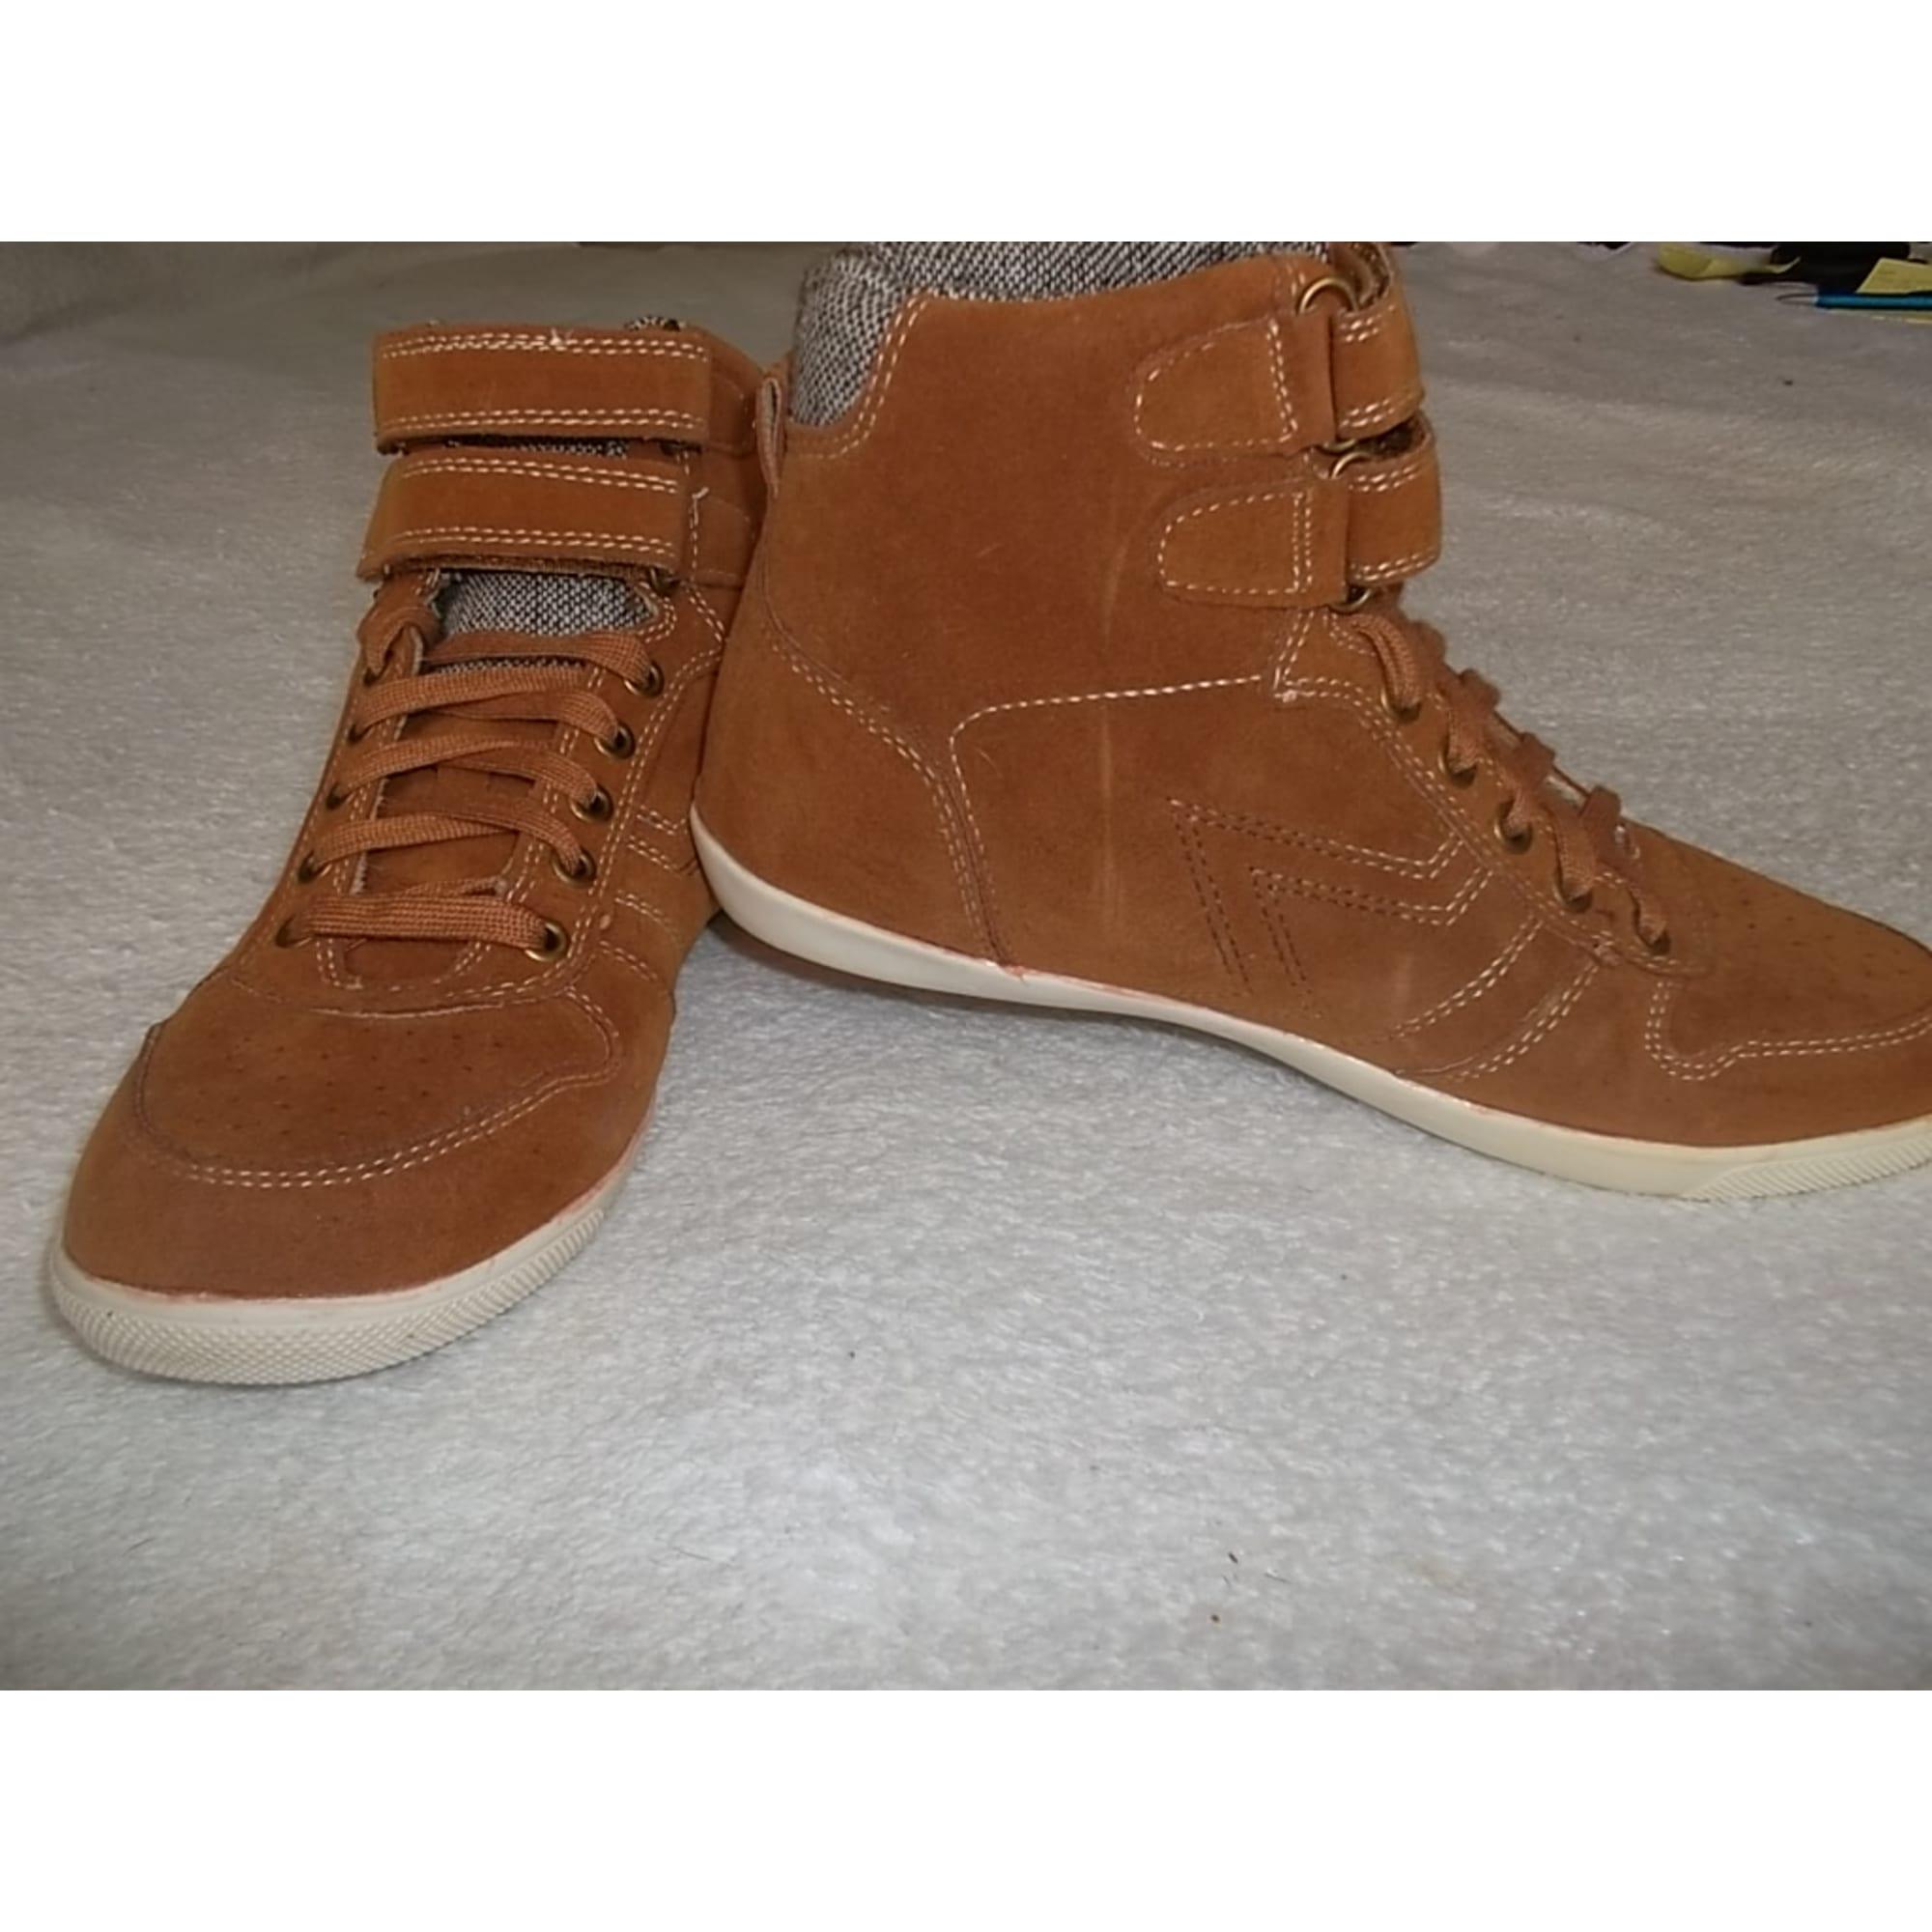 Bottines & low boots plates CREEKS Beige, camel